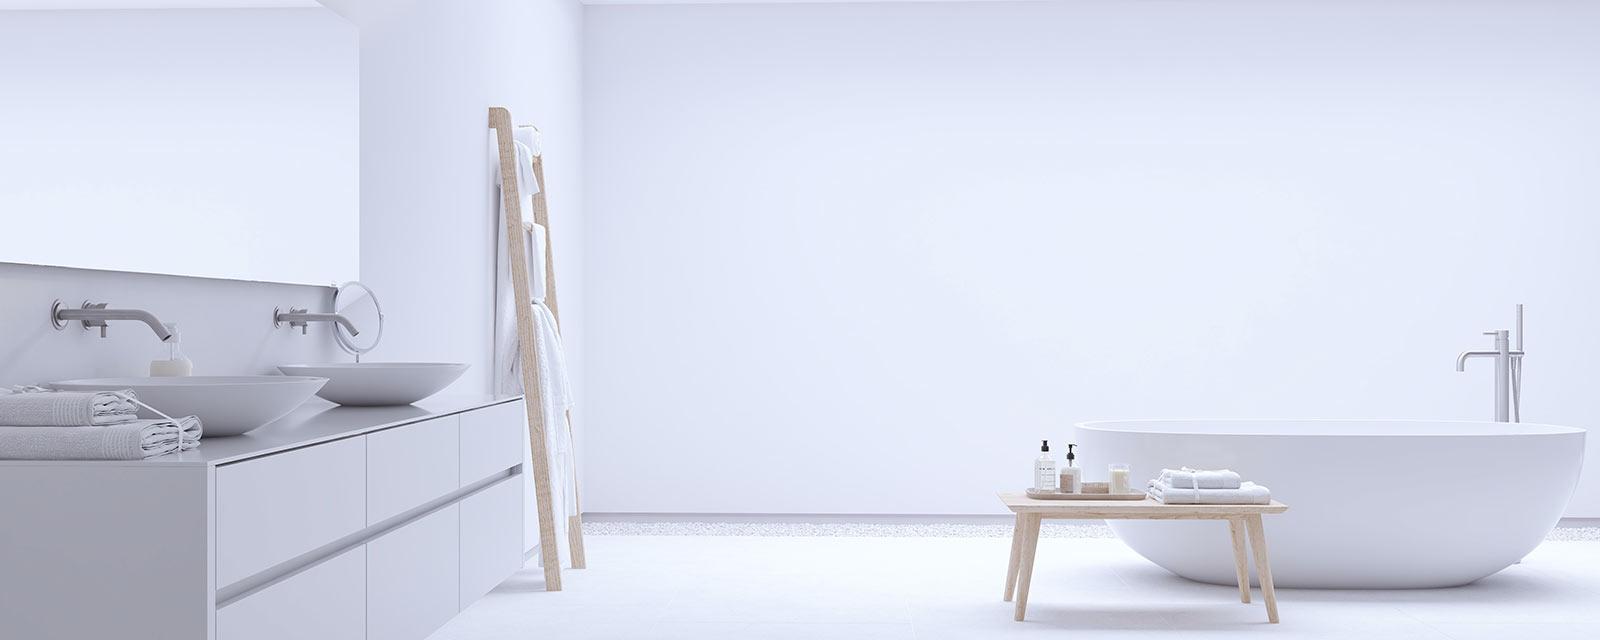 Salle De Bain Minimaliste Le Guide Deco Guide Artisan